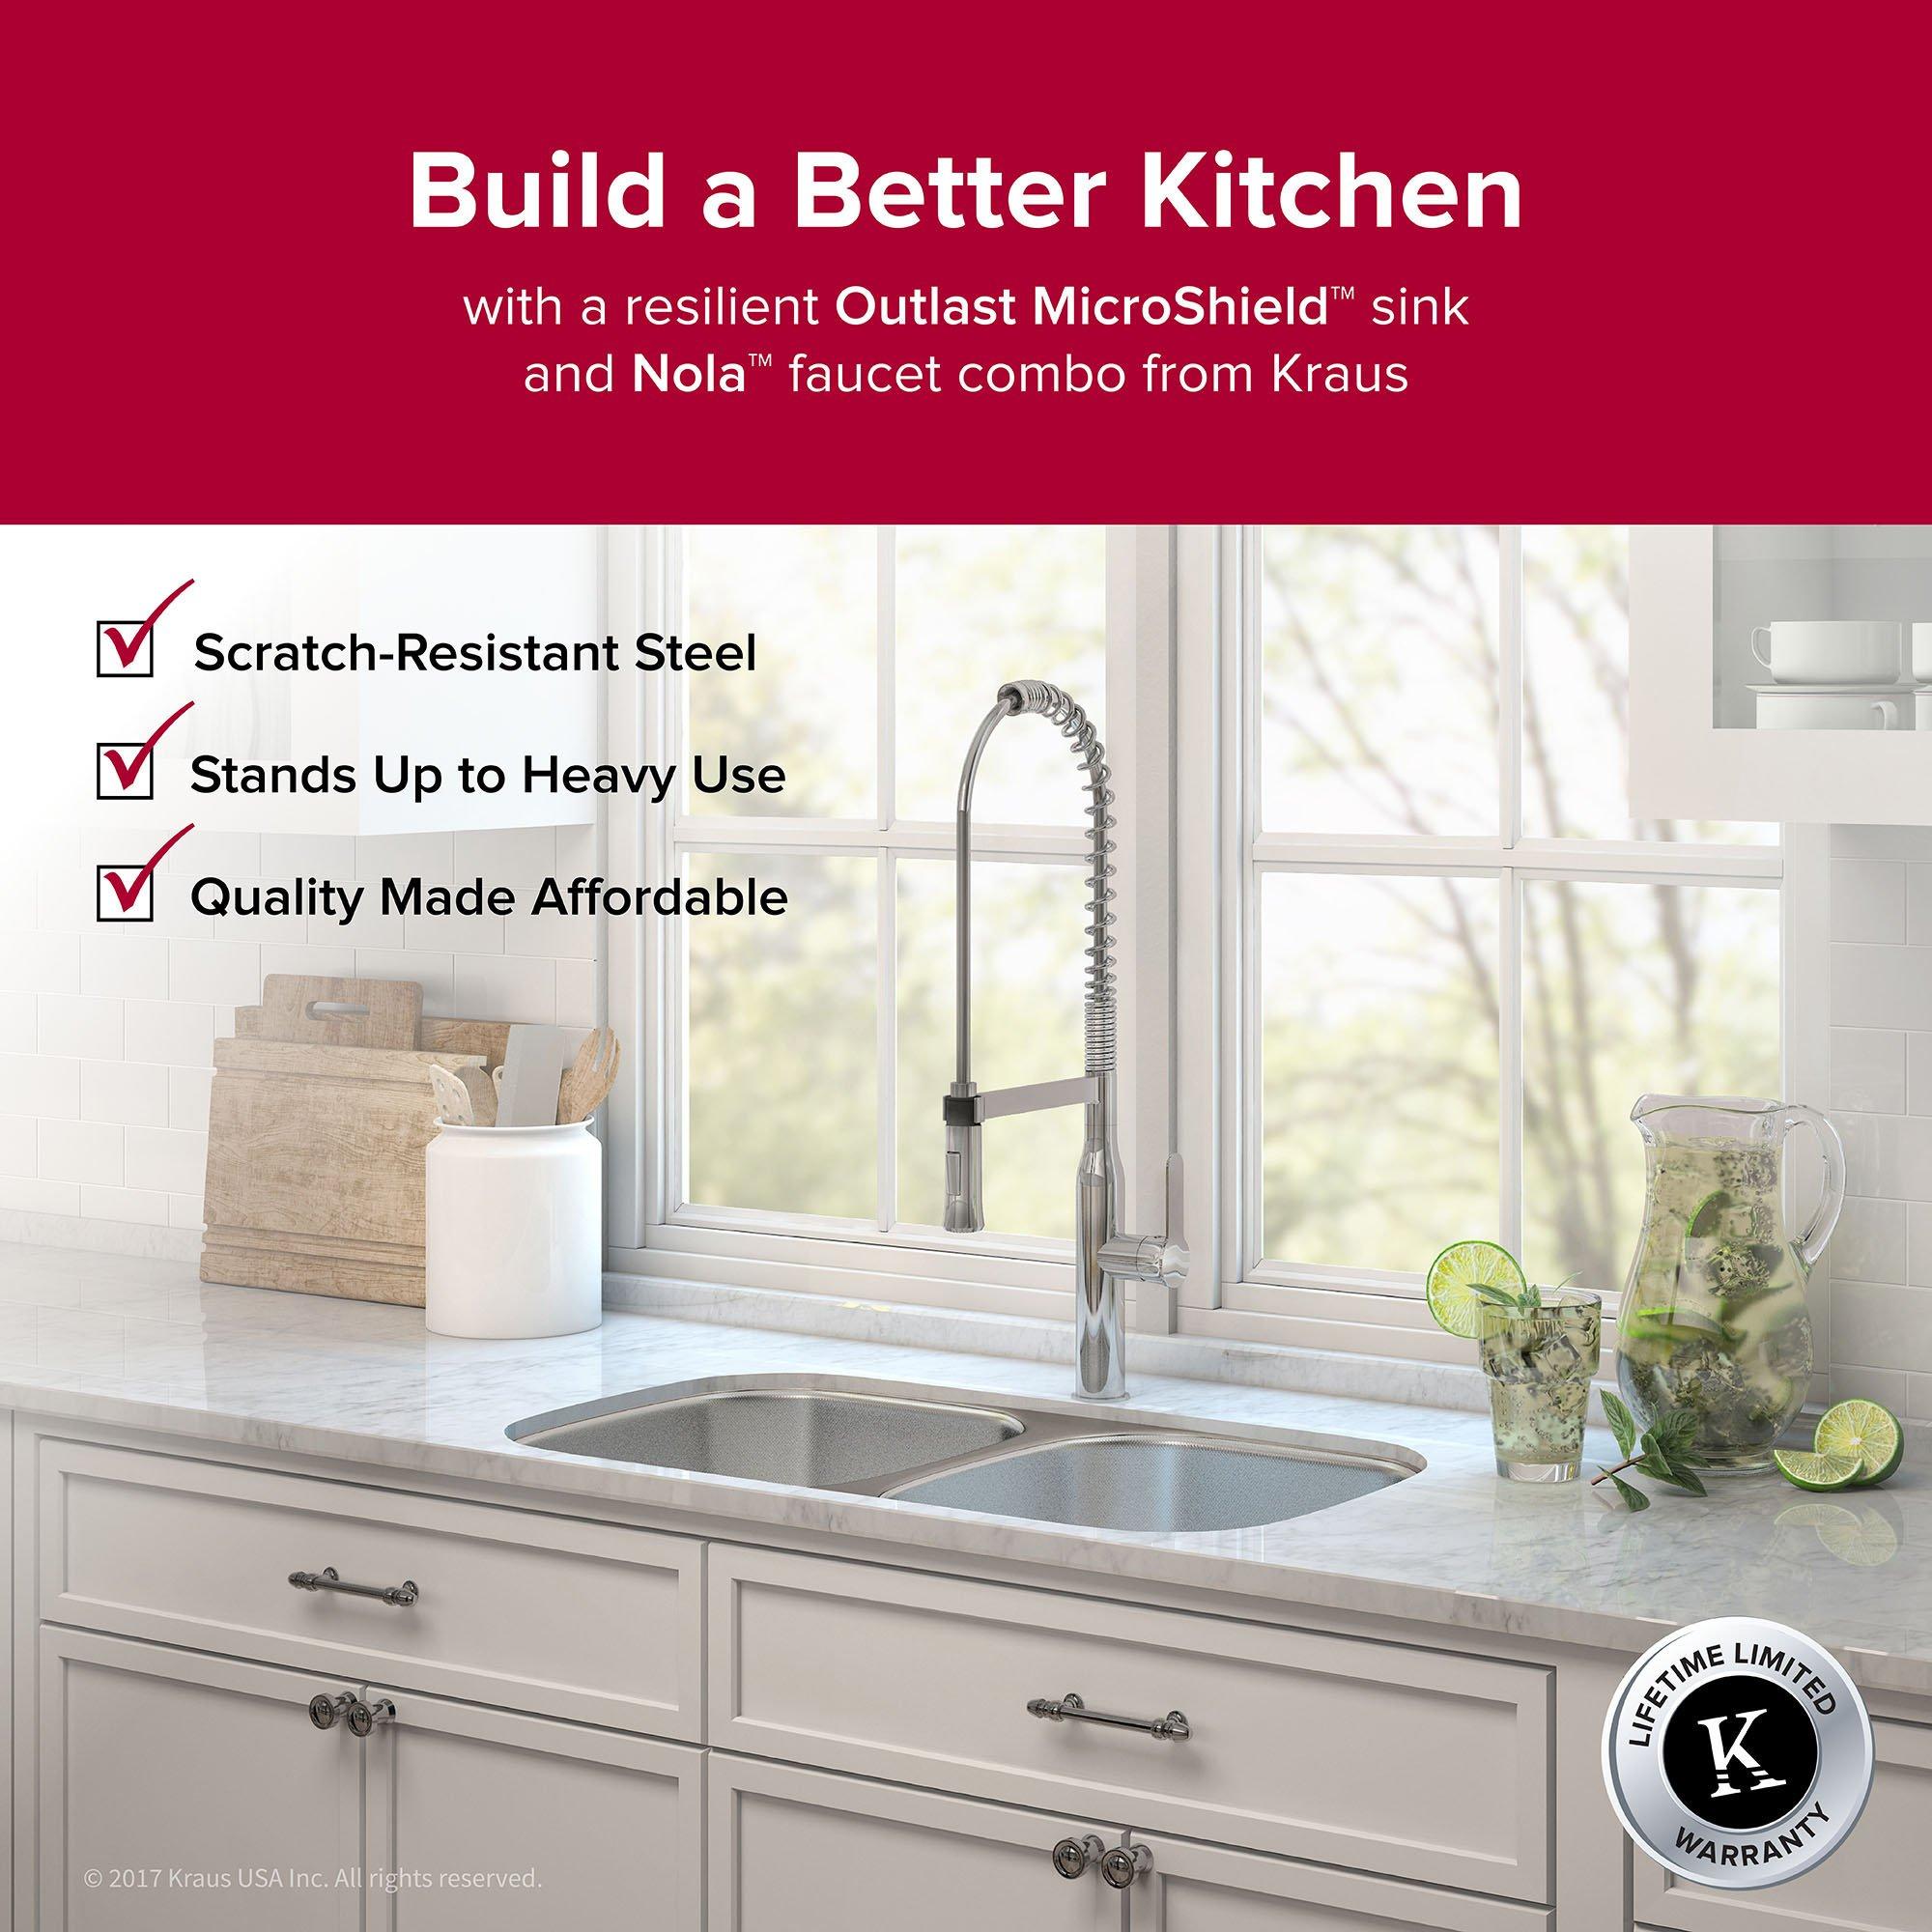 Kraus Outlast MicroShield Scratch-Resist Stainless Steel Undermount 50/50 Double Bowl Sink, 32'' 16 Gauge, Premier Series KBU22E by Kraus (Image #3)